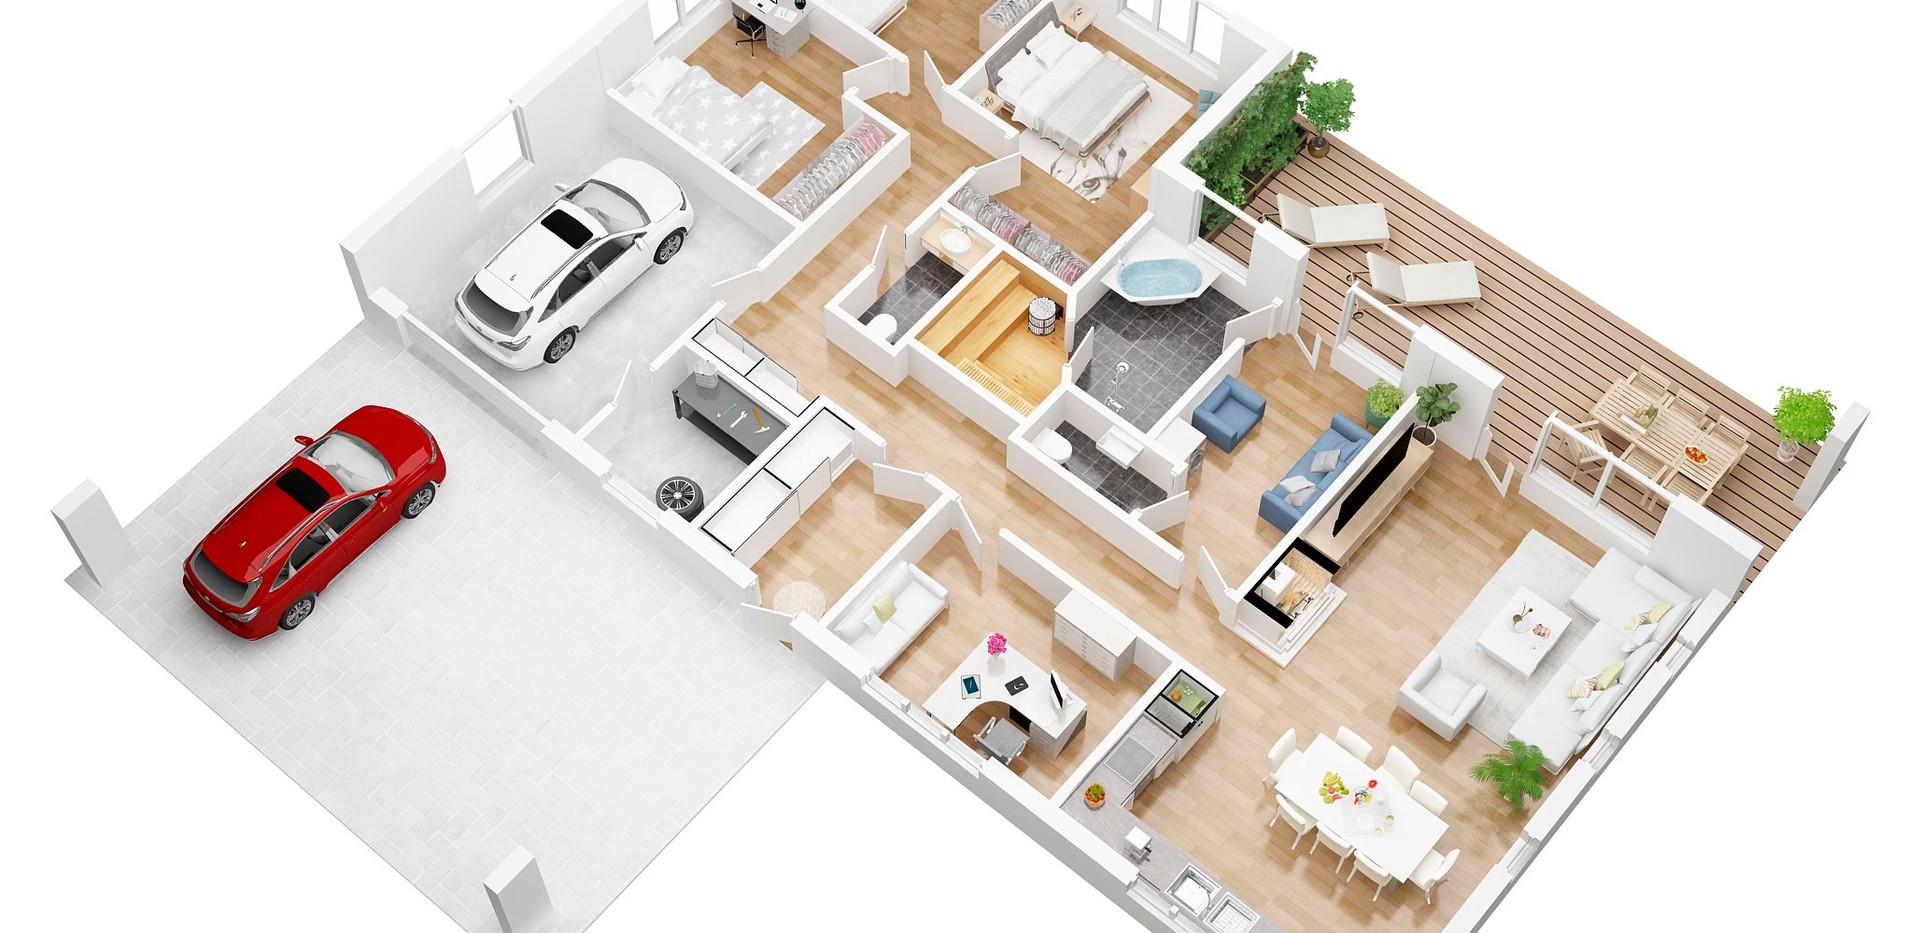 rihoOO_3D  floor plan